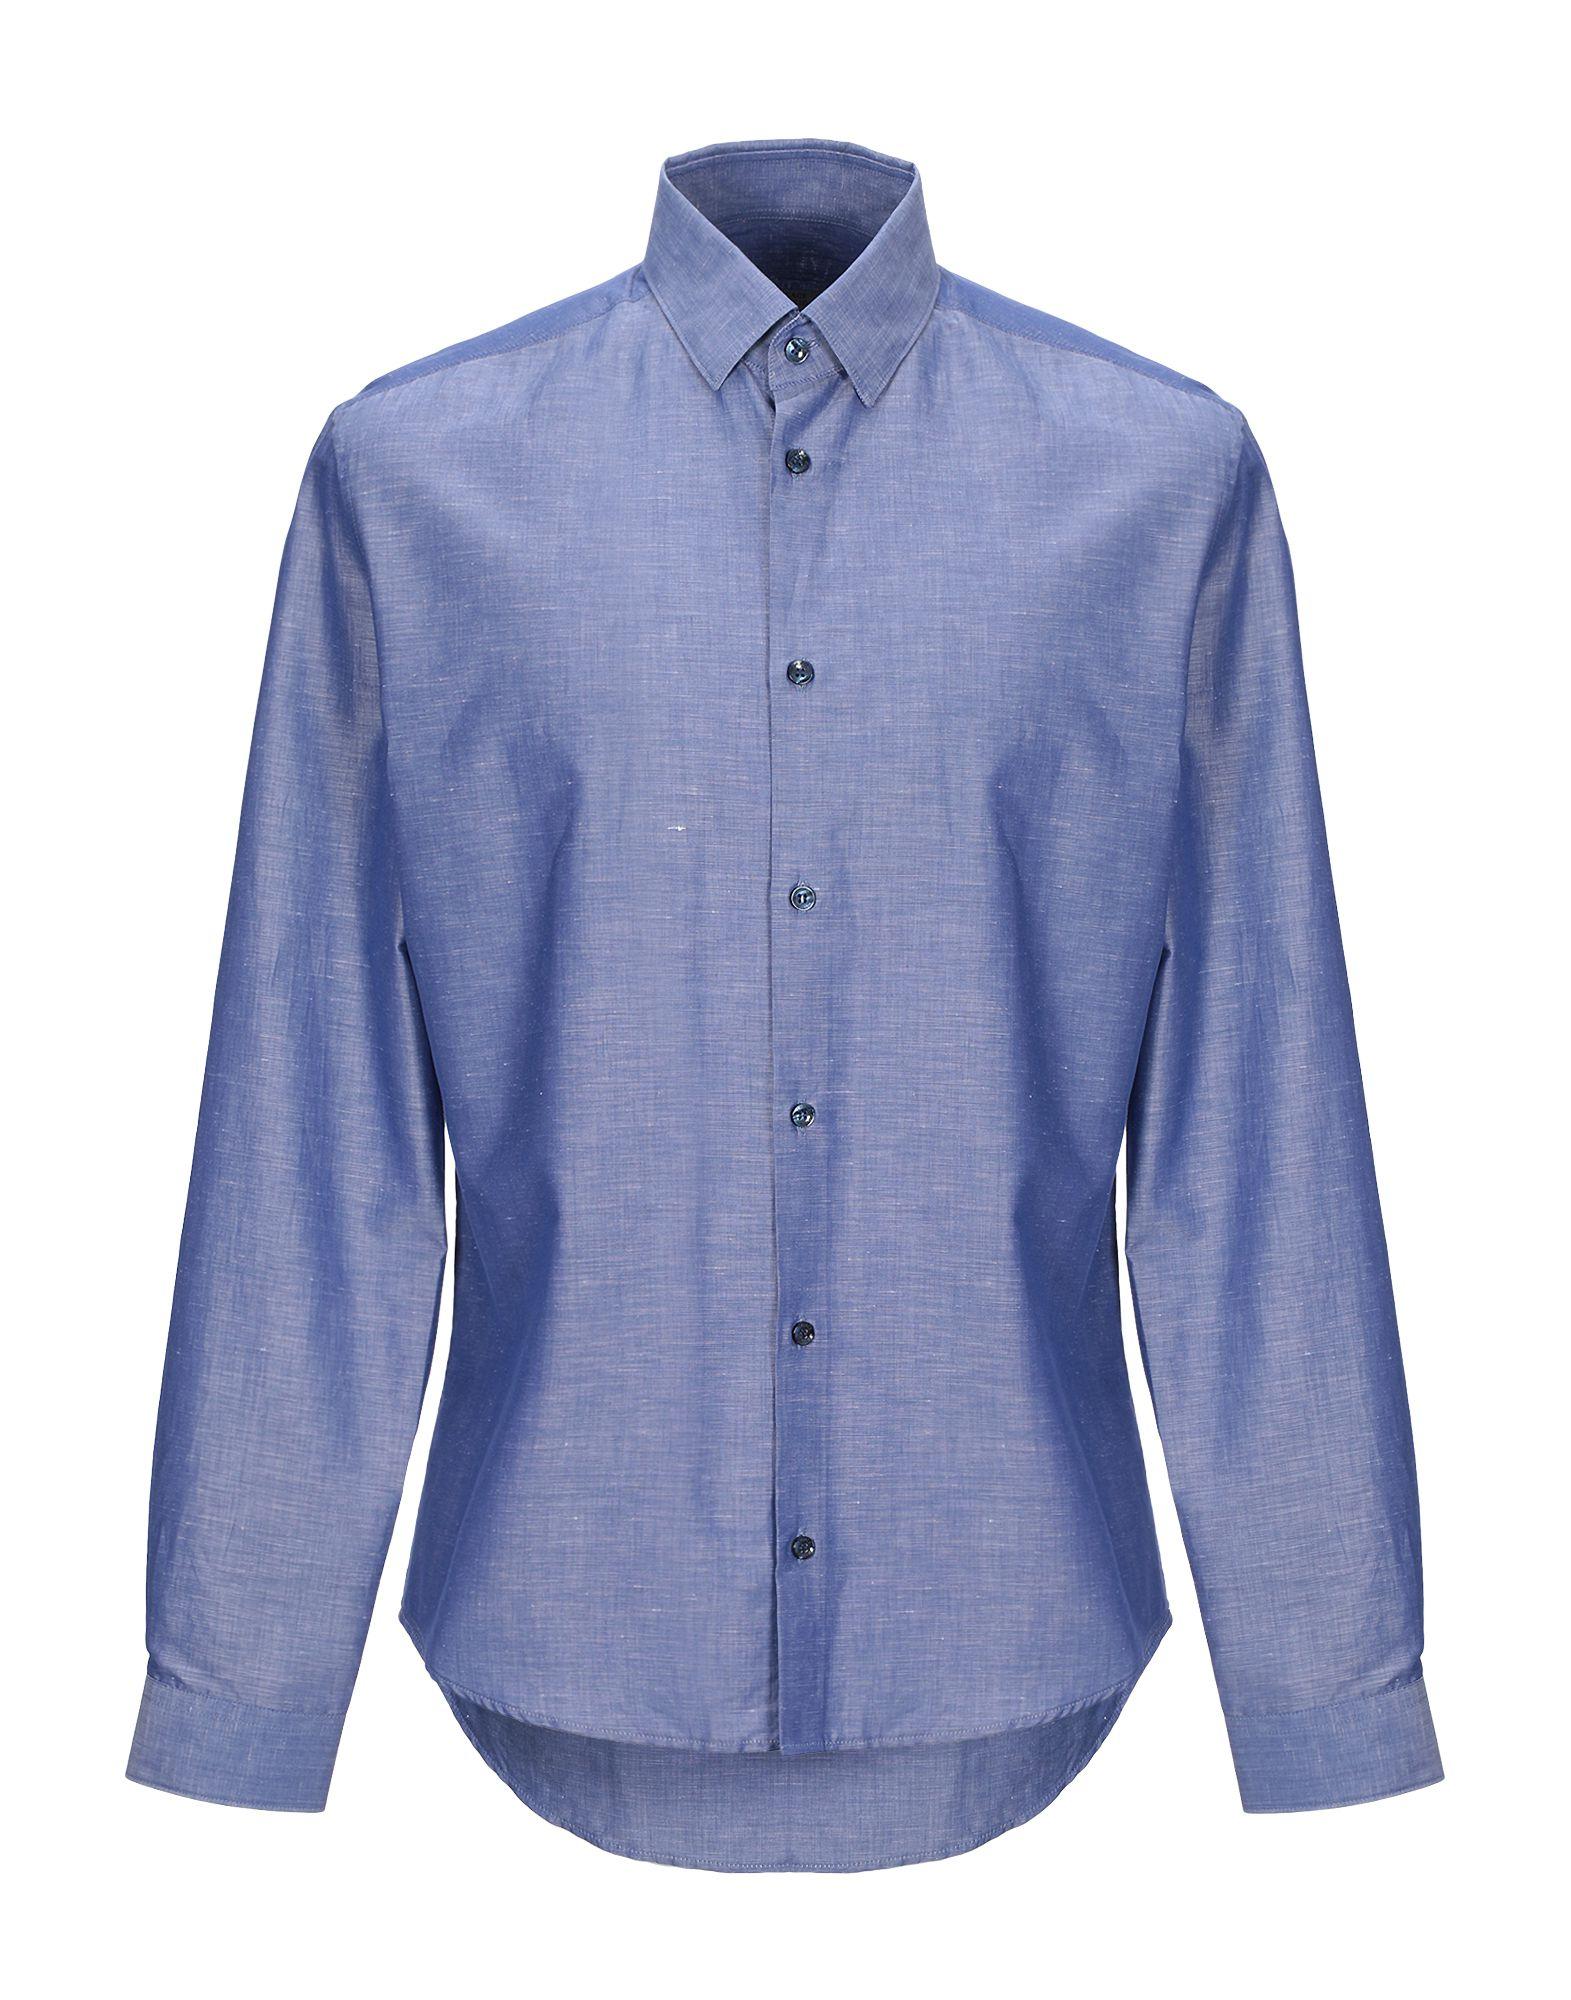 VERSACE COLLECTION Джинсовая рубашка uniel bv 415bks